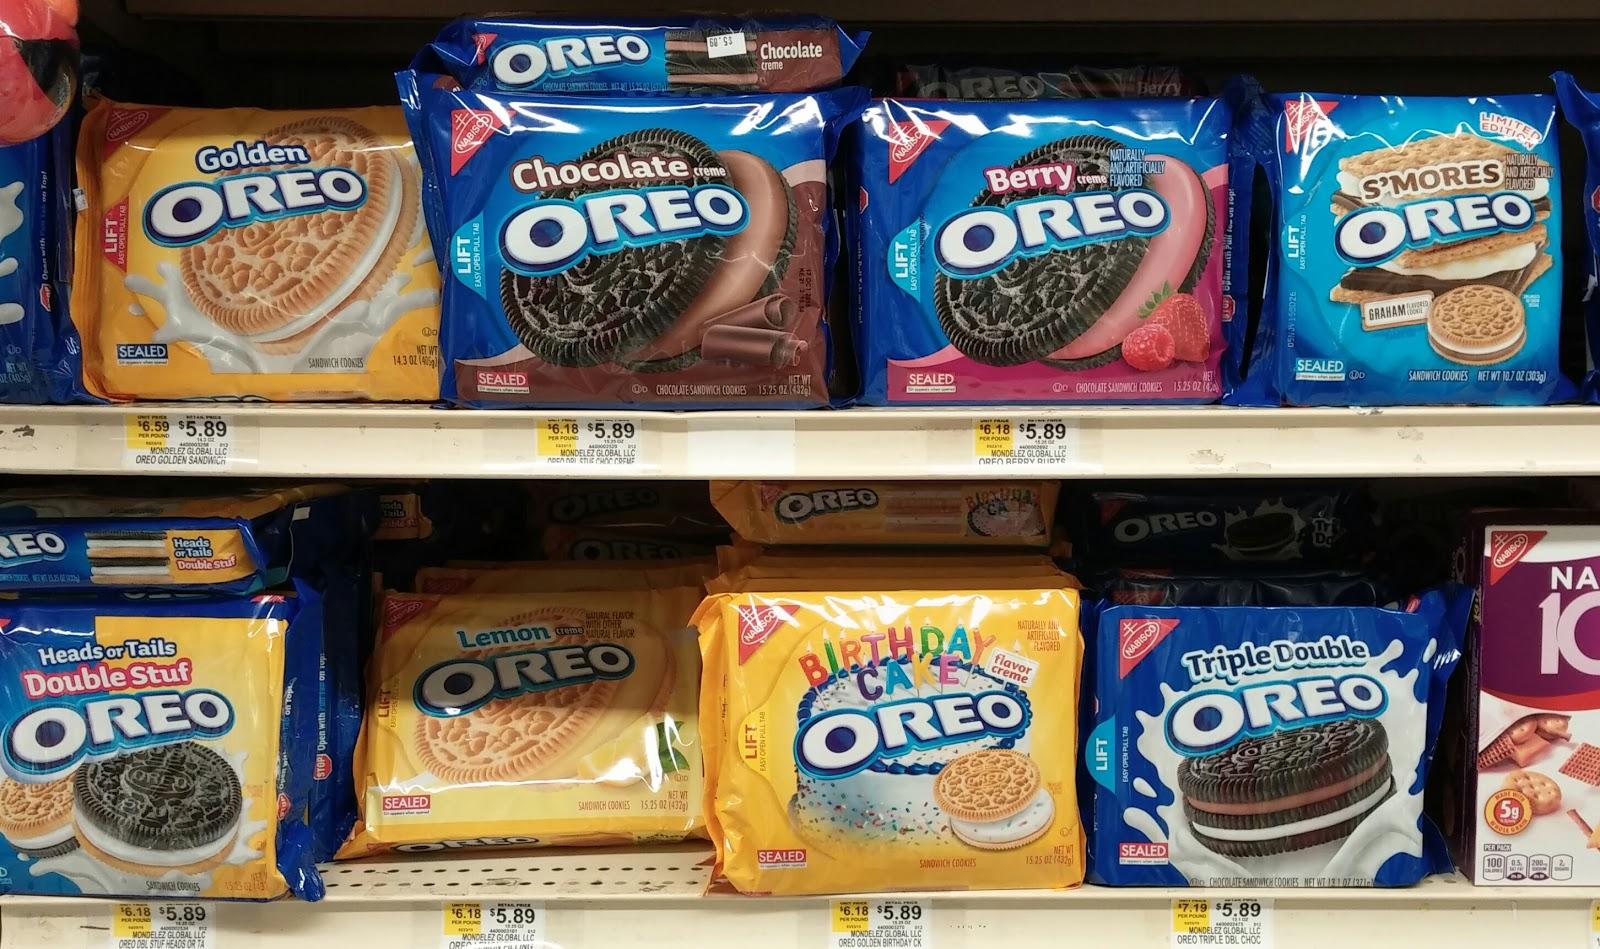 Double Stuff Oreo Calories